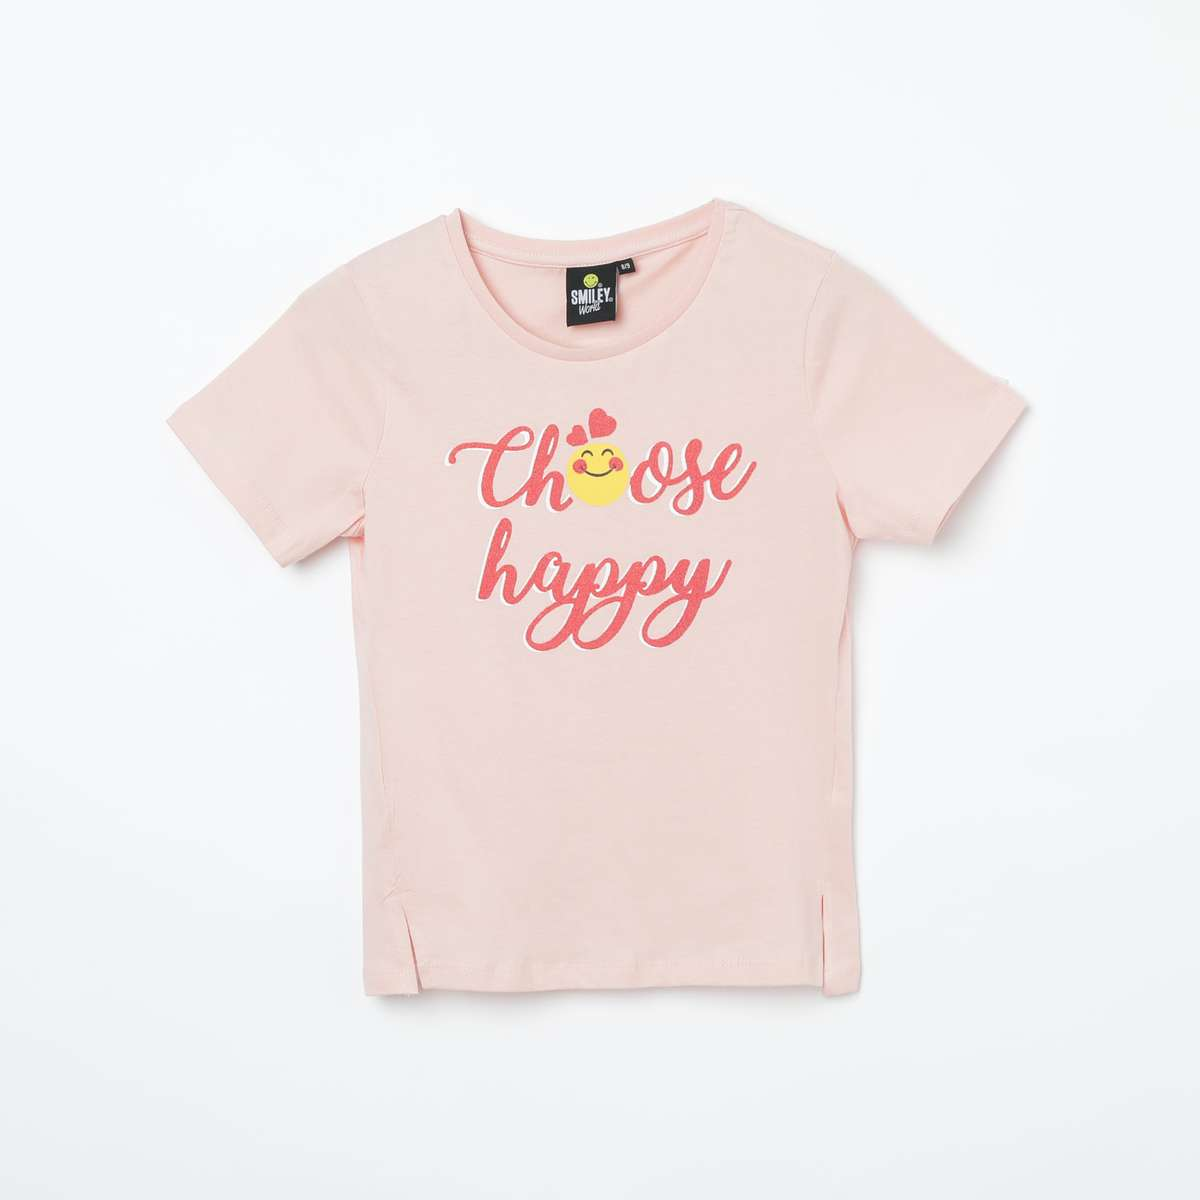 3g. SMILEYWORLD Printed Cap Sleeves T-shirt